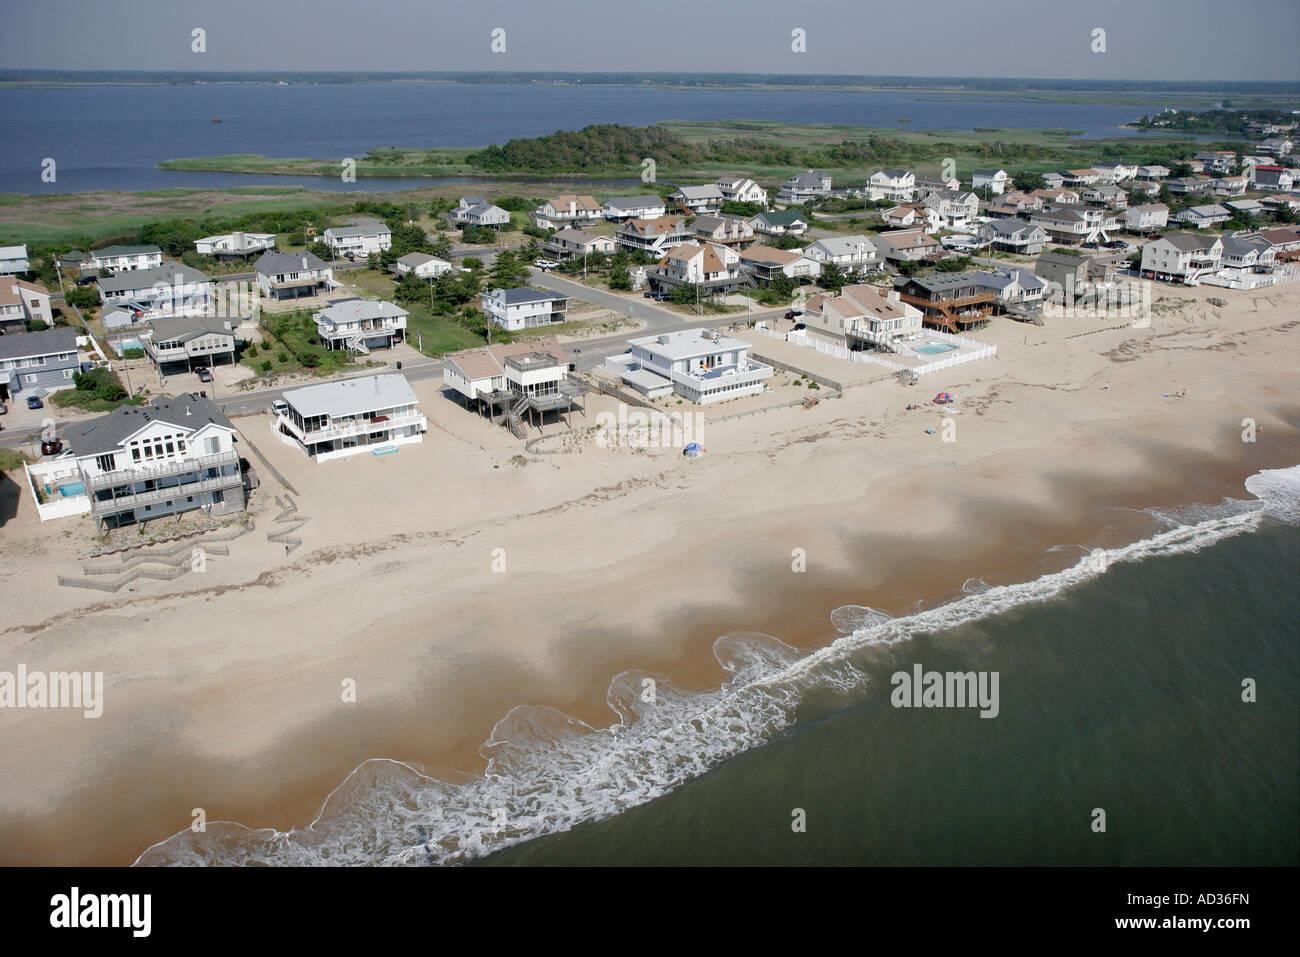 Middle eastern singles in atlantic beach